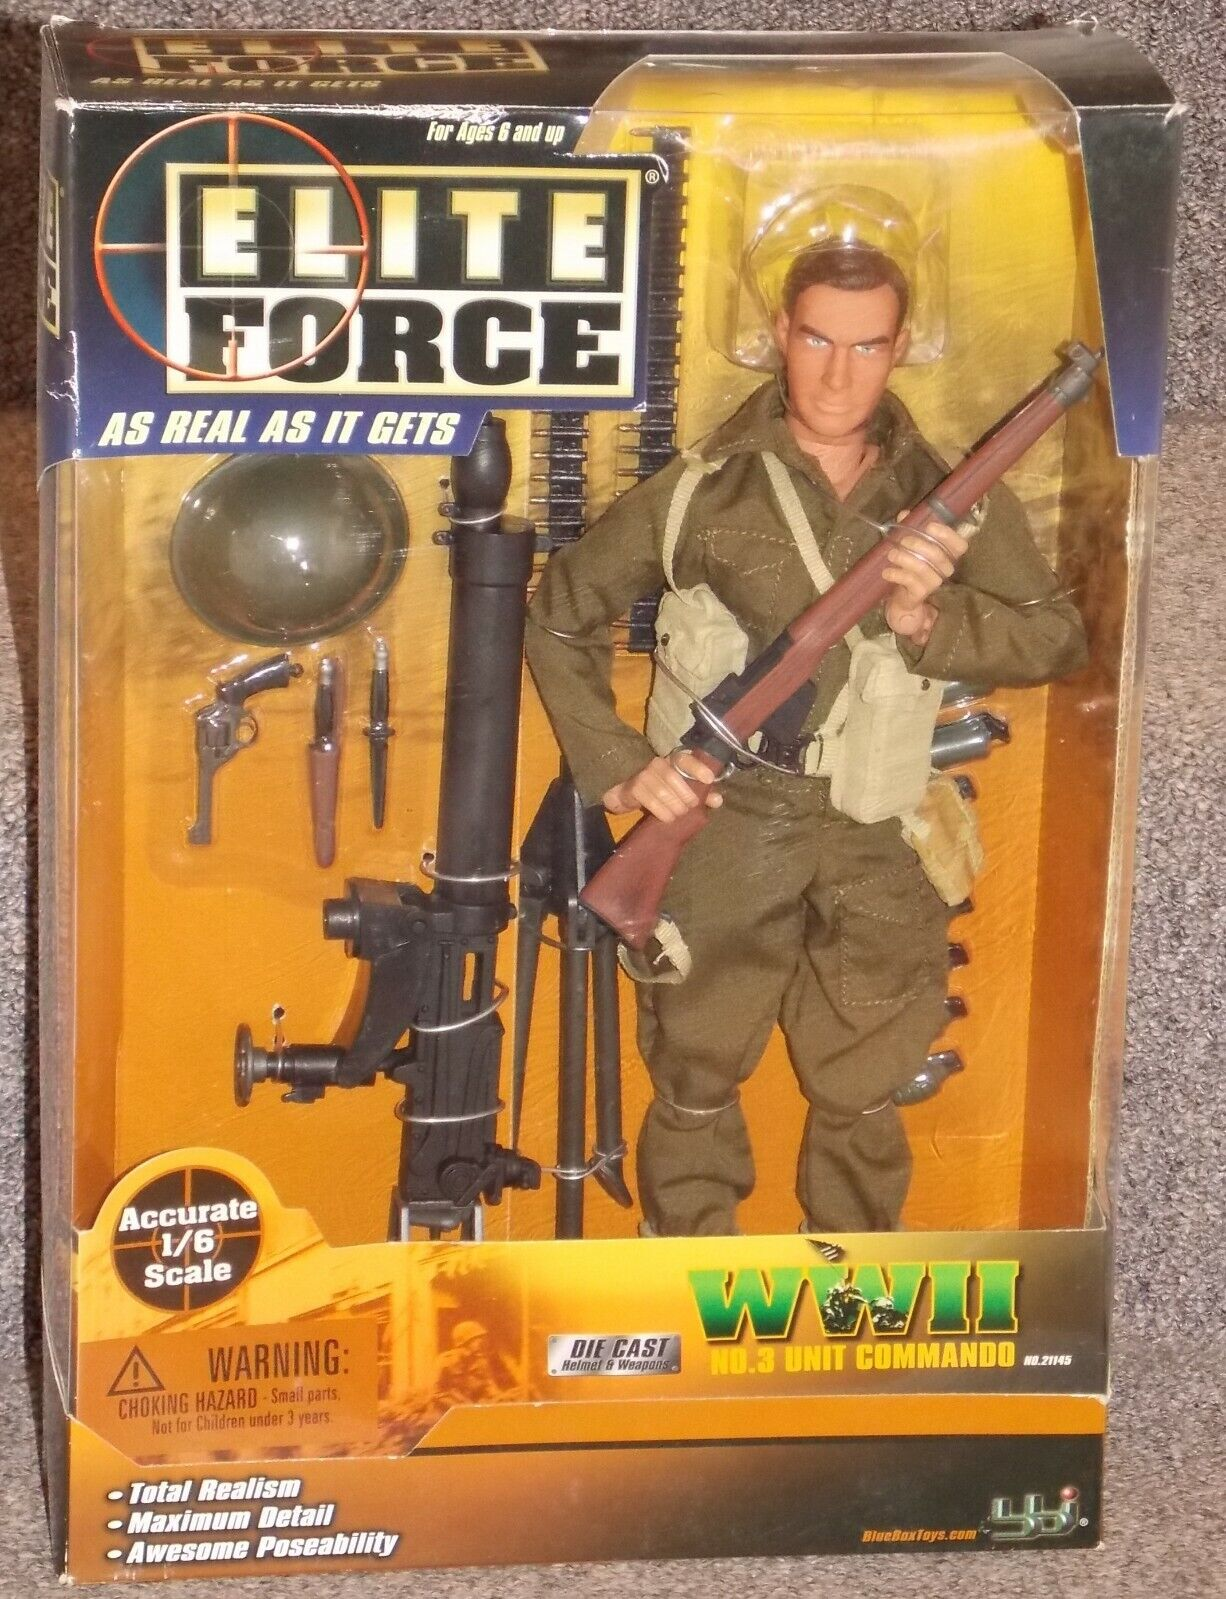 2002 Elite Force WW2 Unit Commando 1 6th Scale Action Figure New In The Box